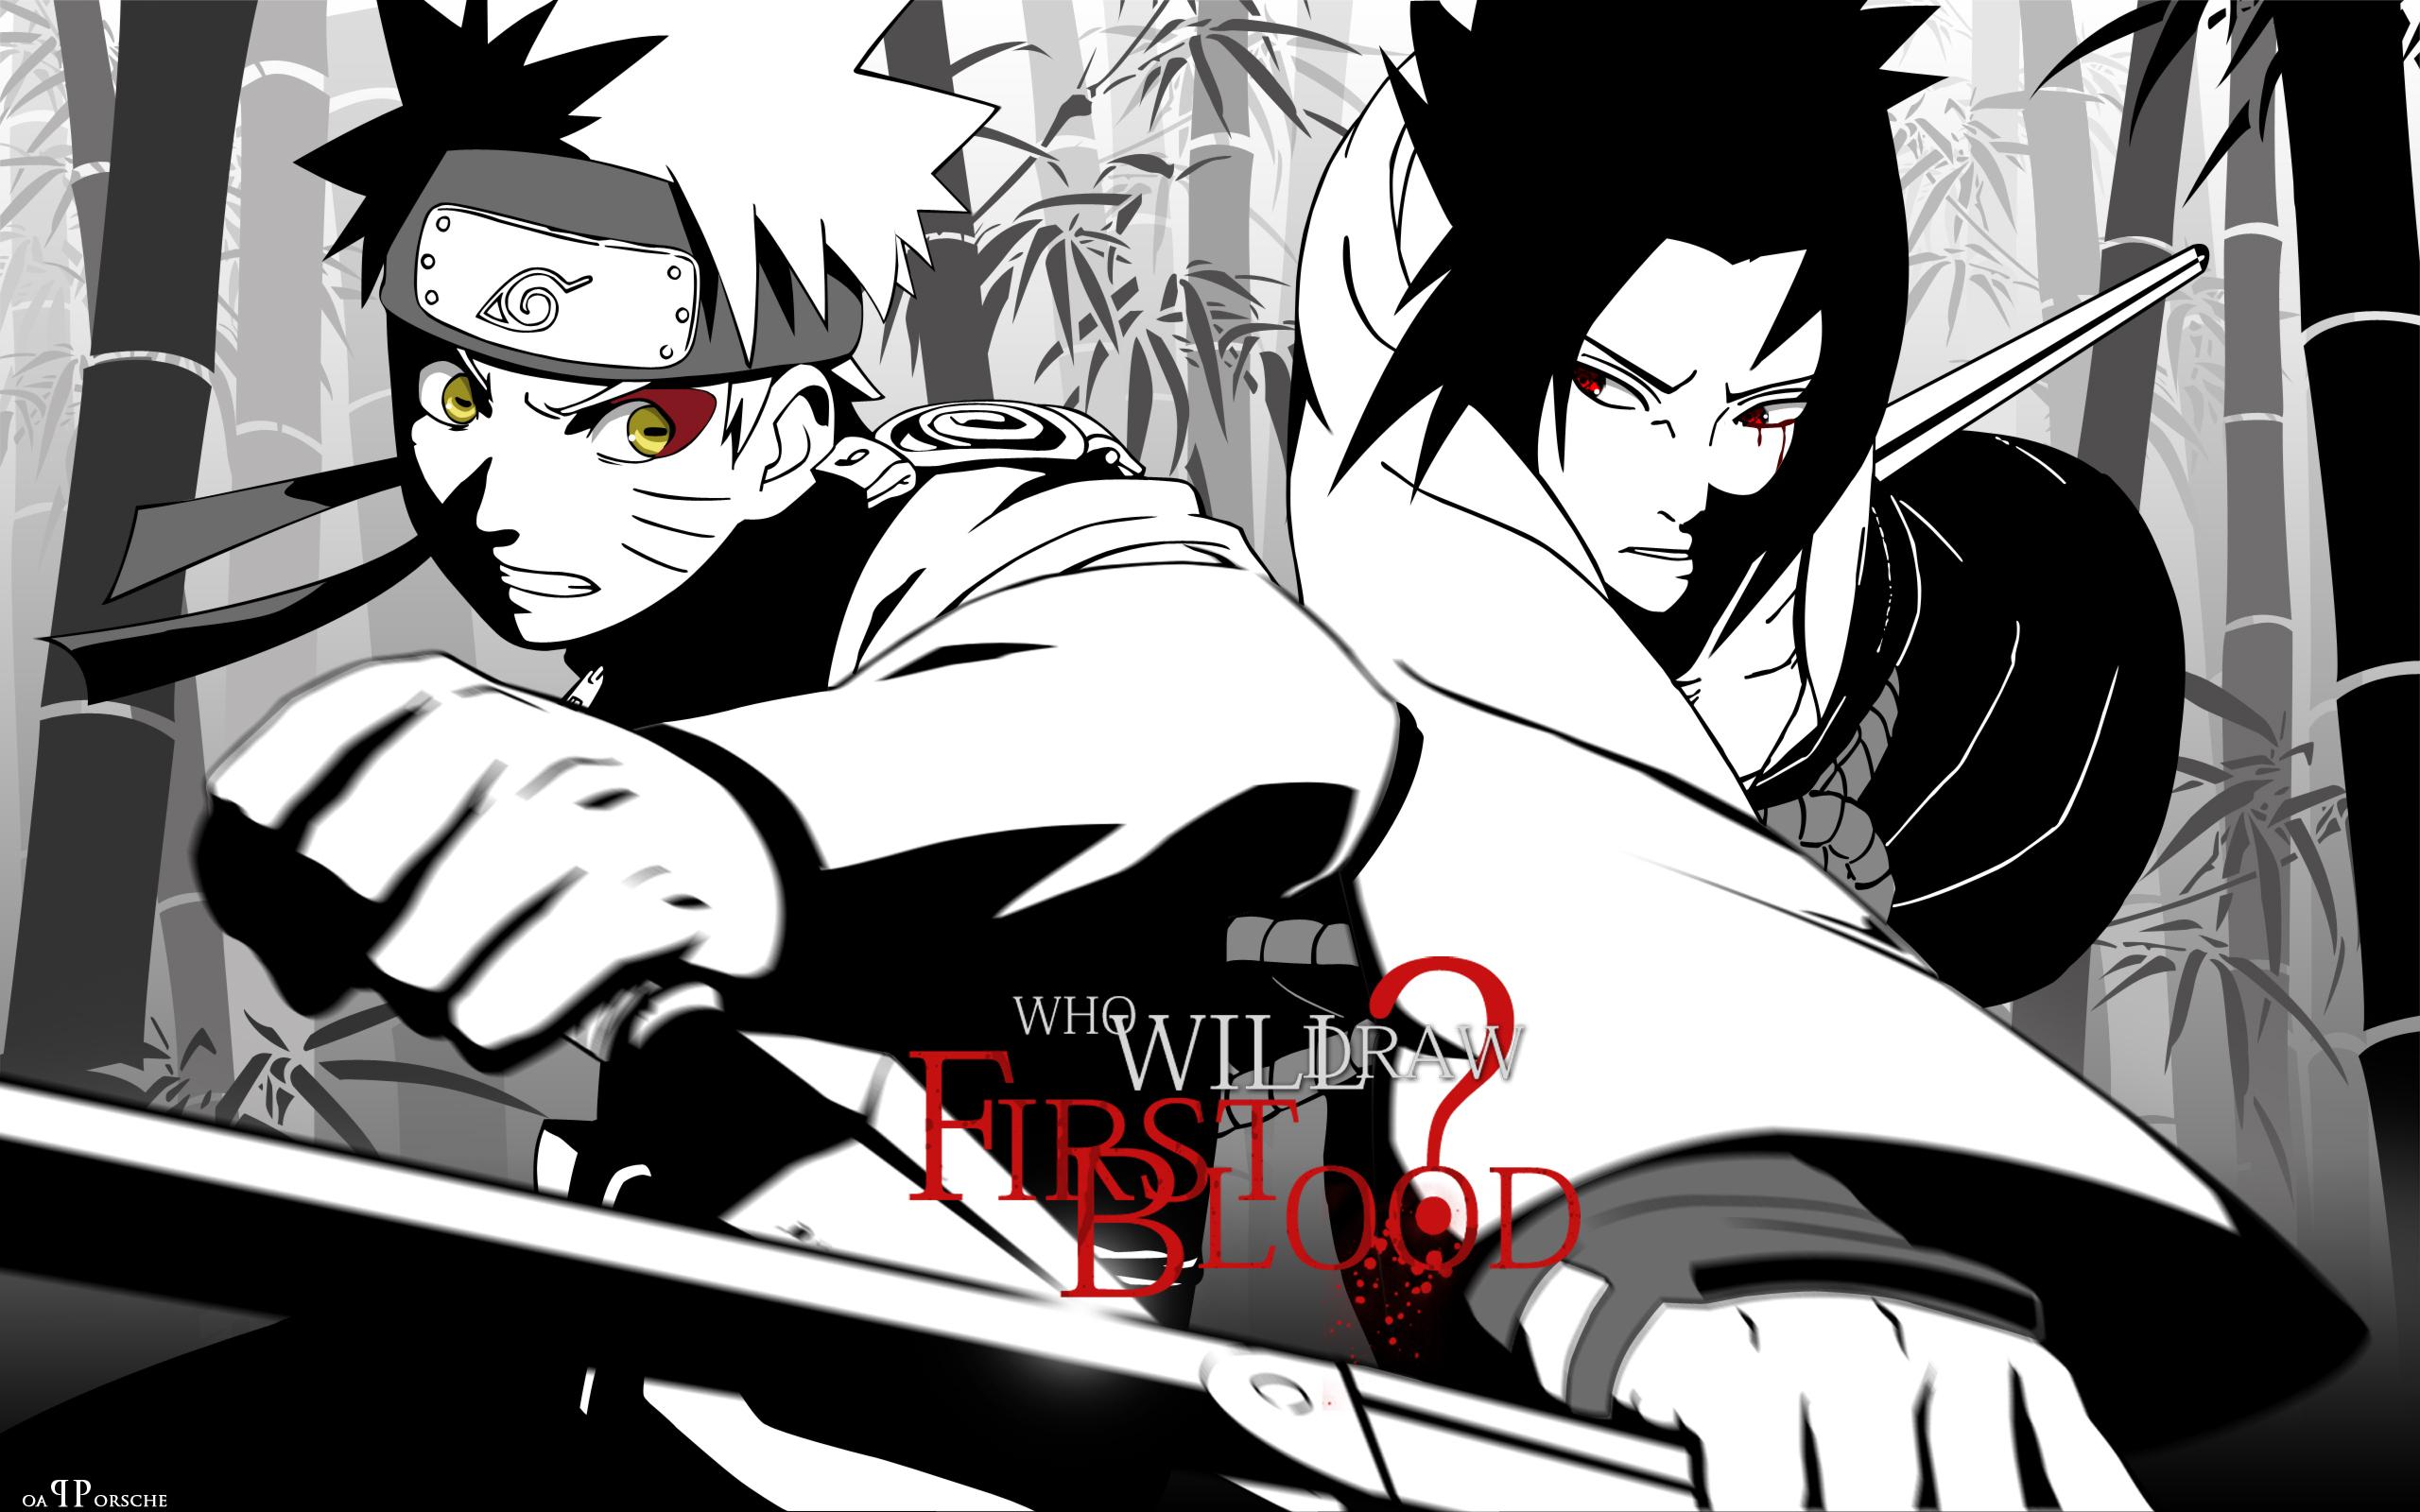 Great   Wallpaper Home Screen Naruto - 1wUjlju  Perfect Image Reference_183356.tt/1wUjlju